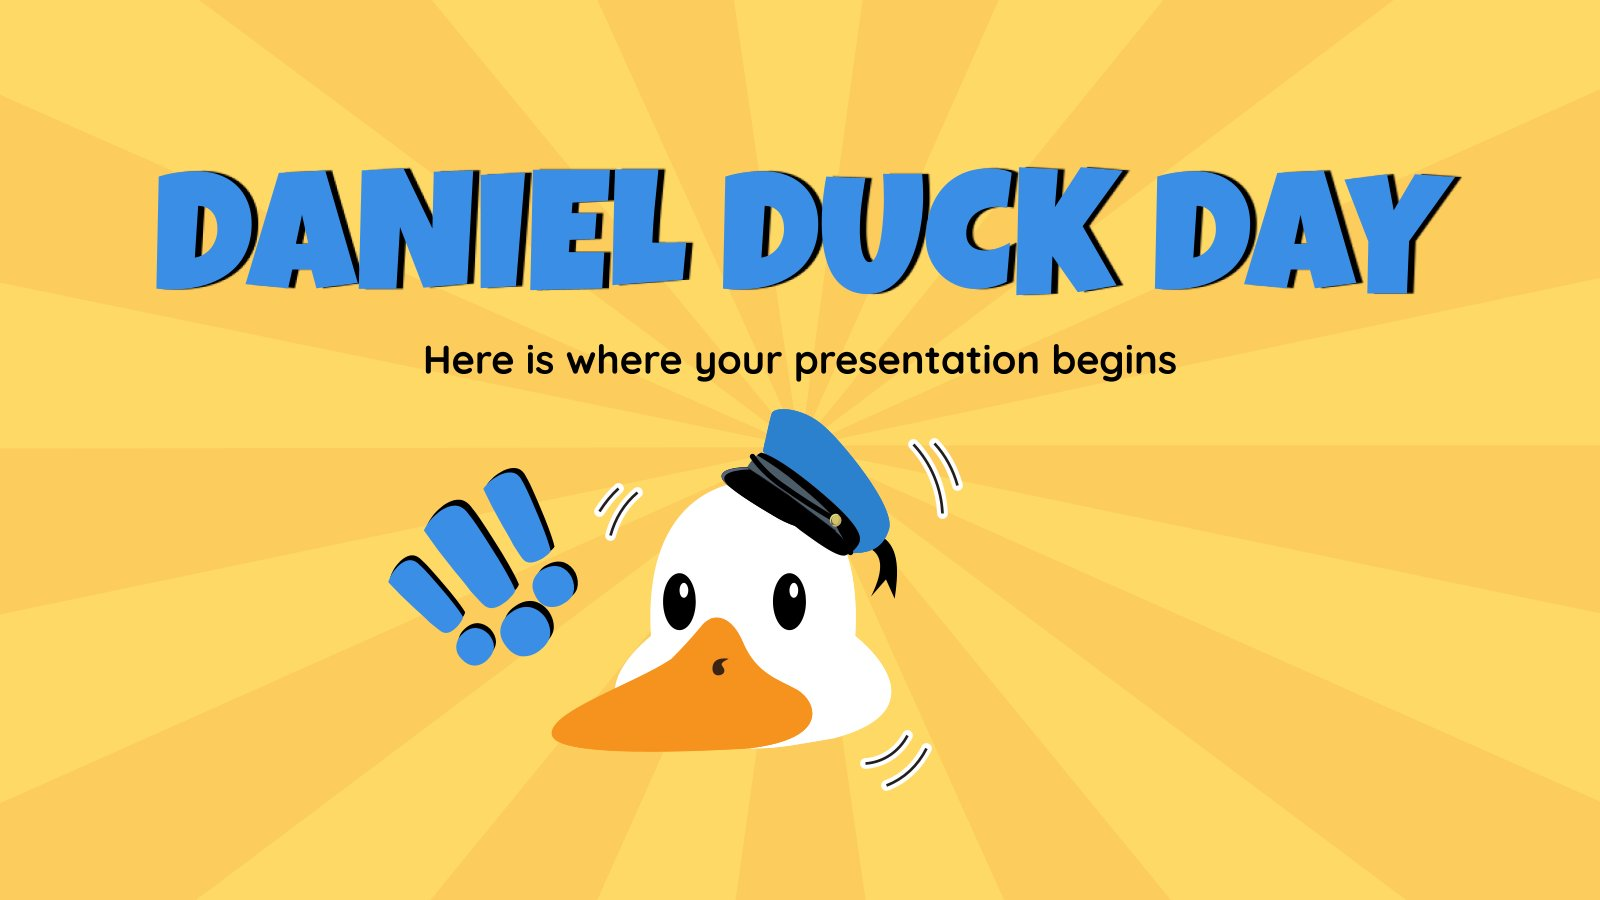 Daniel Duck Day presentation template